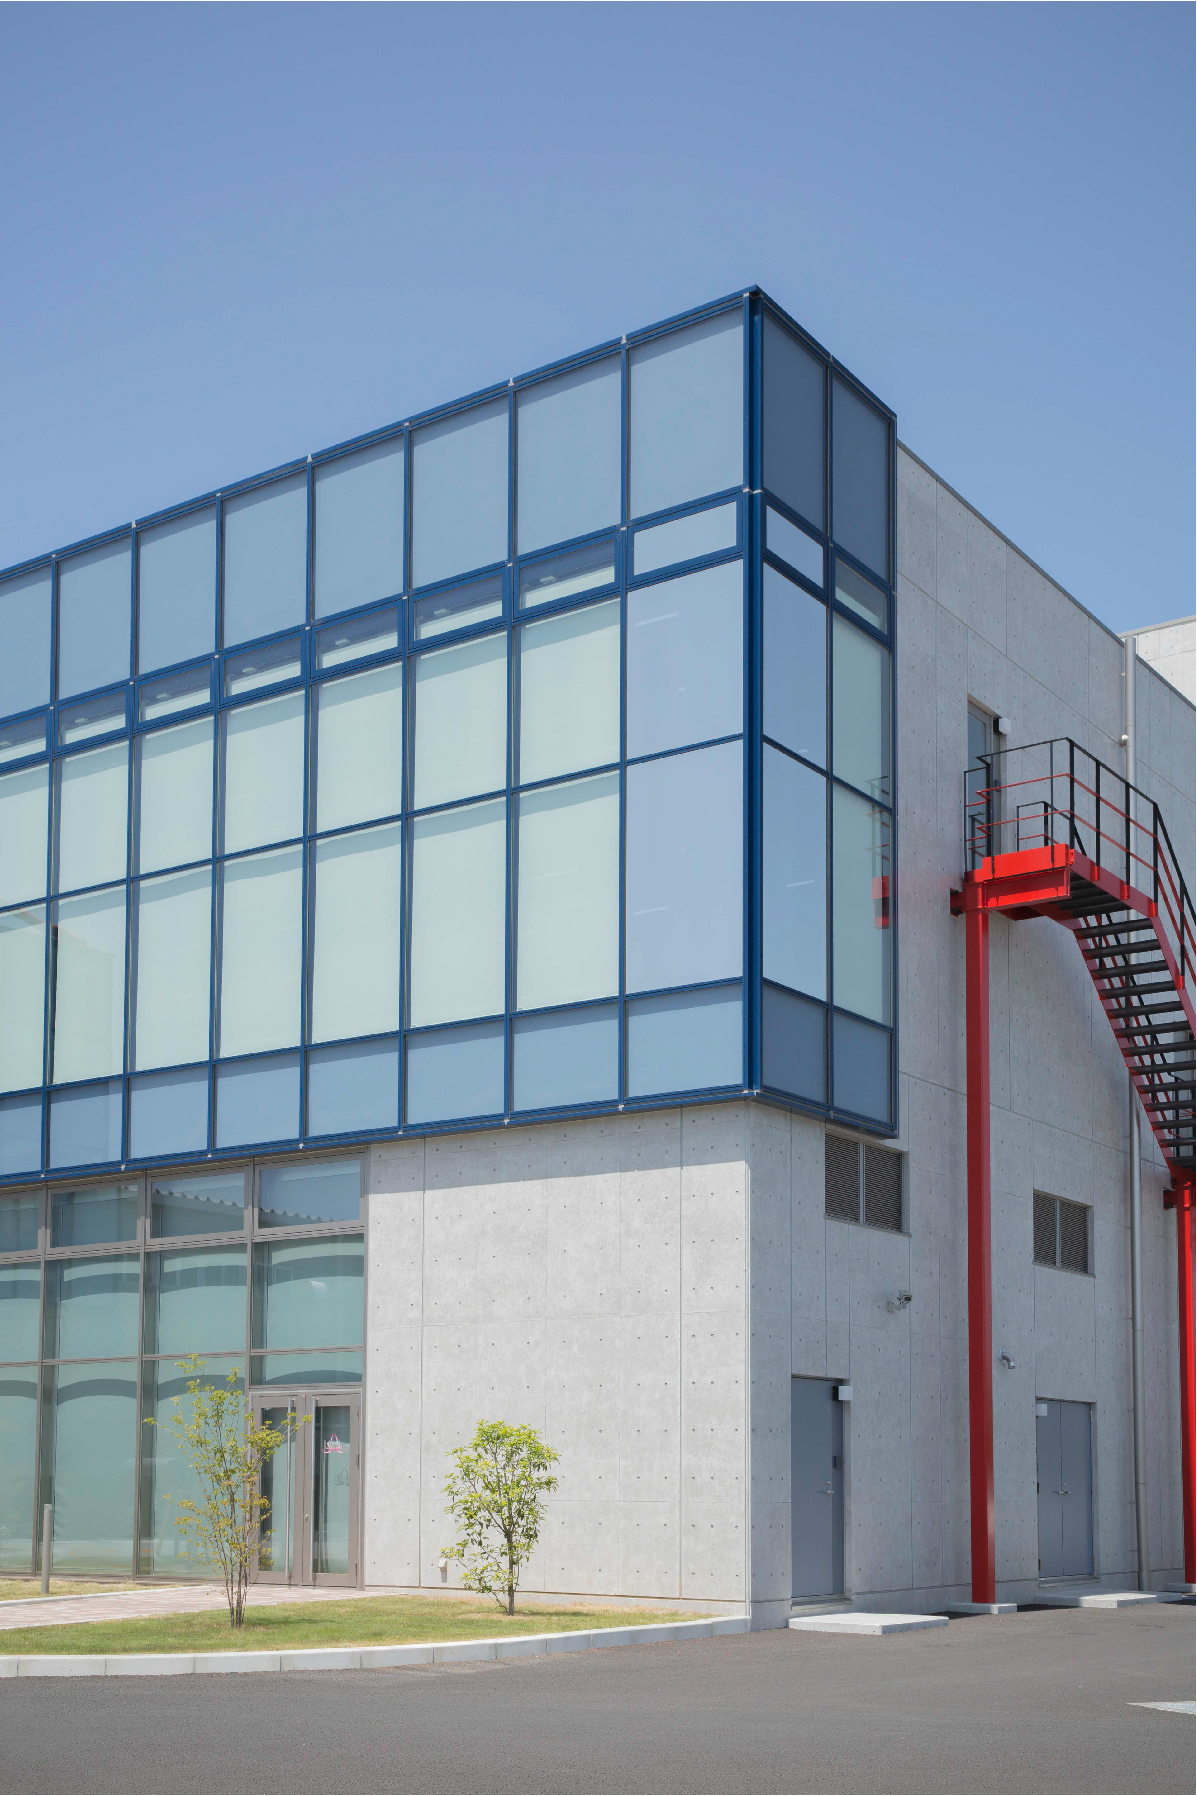 cs laboratory building